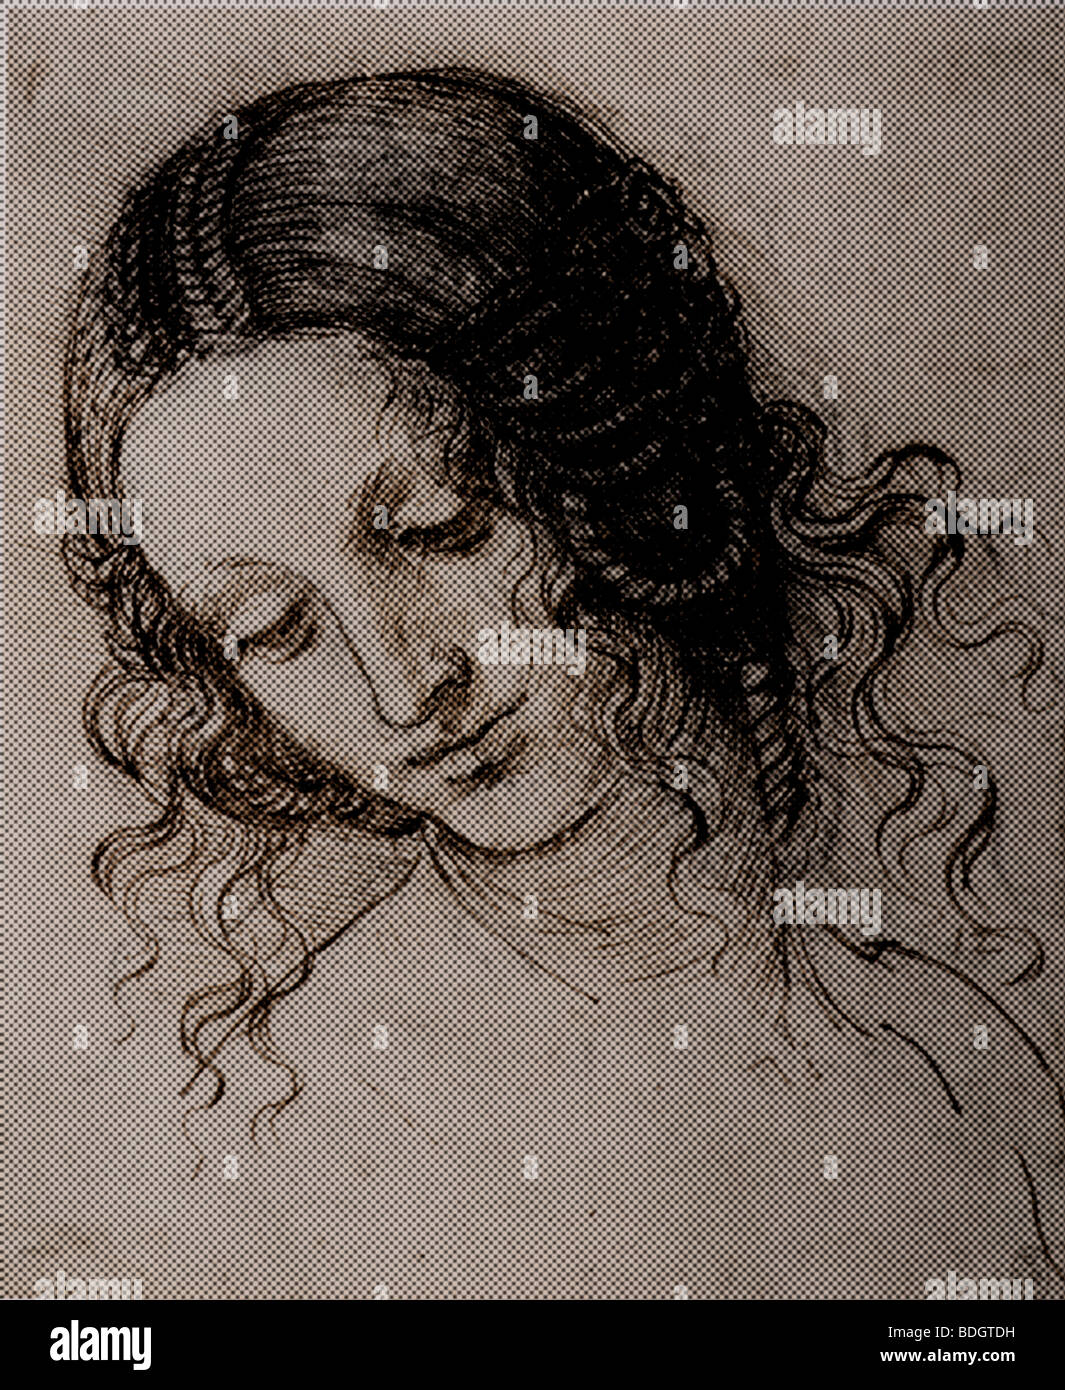 Study of the head of Leda by Leonardo da Vinci halftone pattern - Stock Image